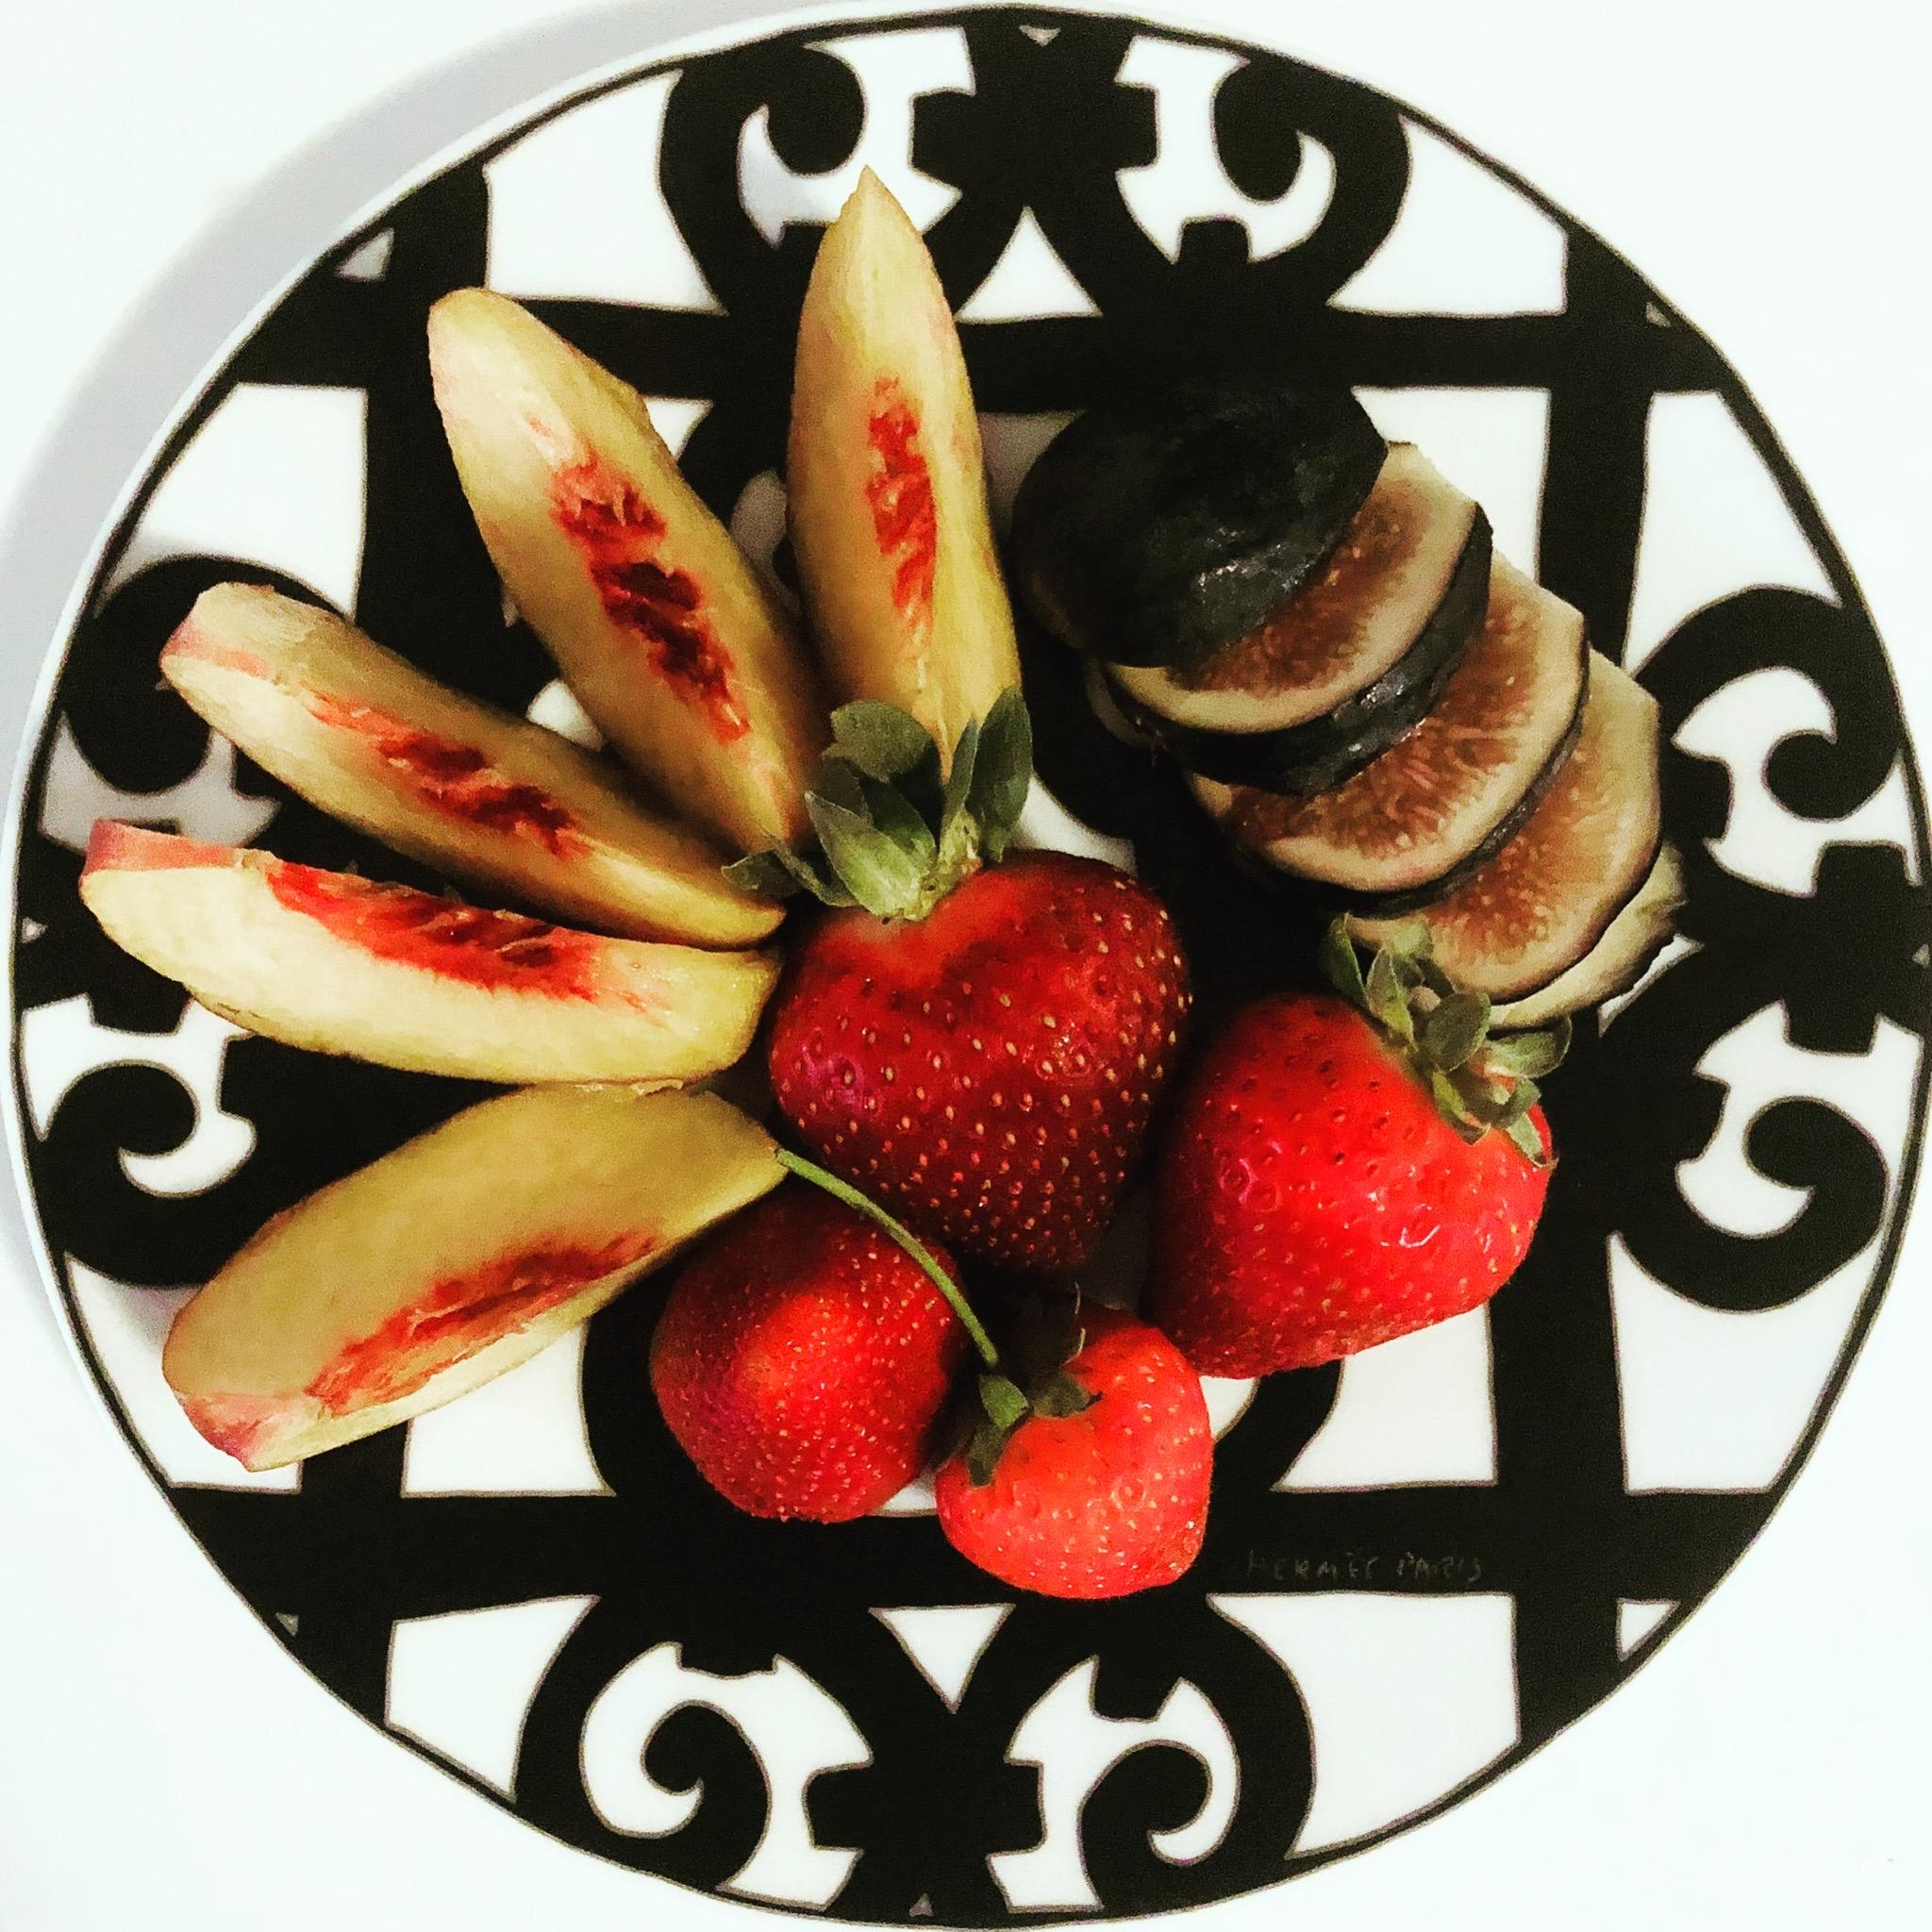 HERMÈS FRUIT PLATE